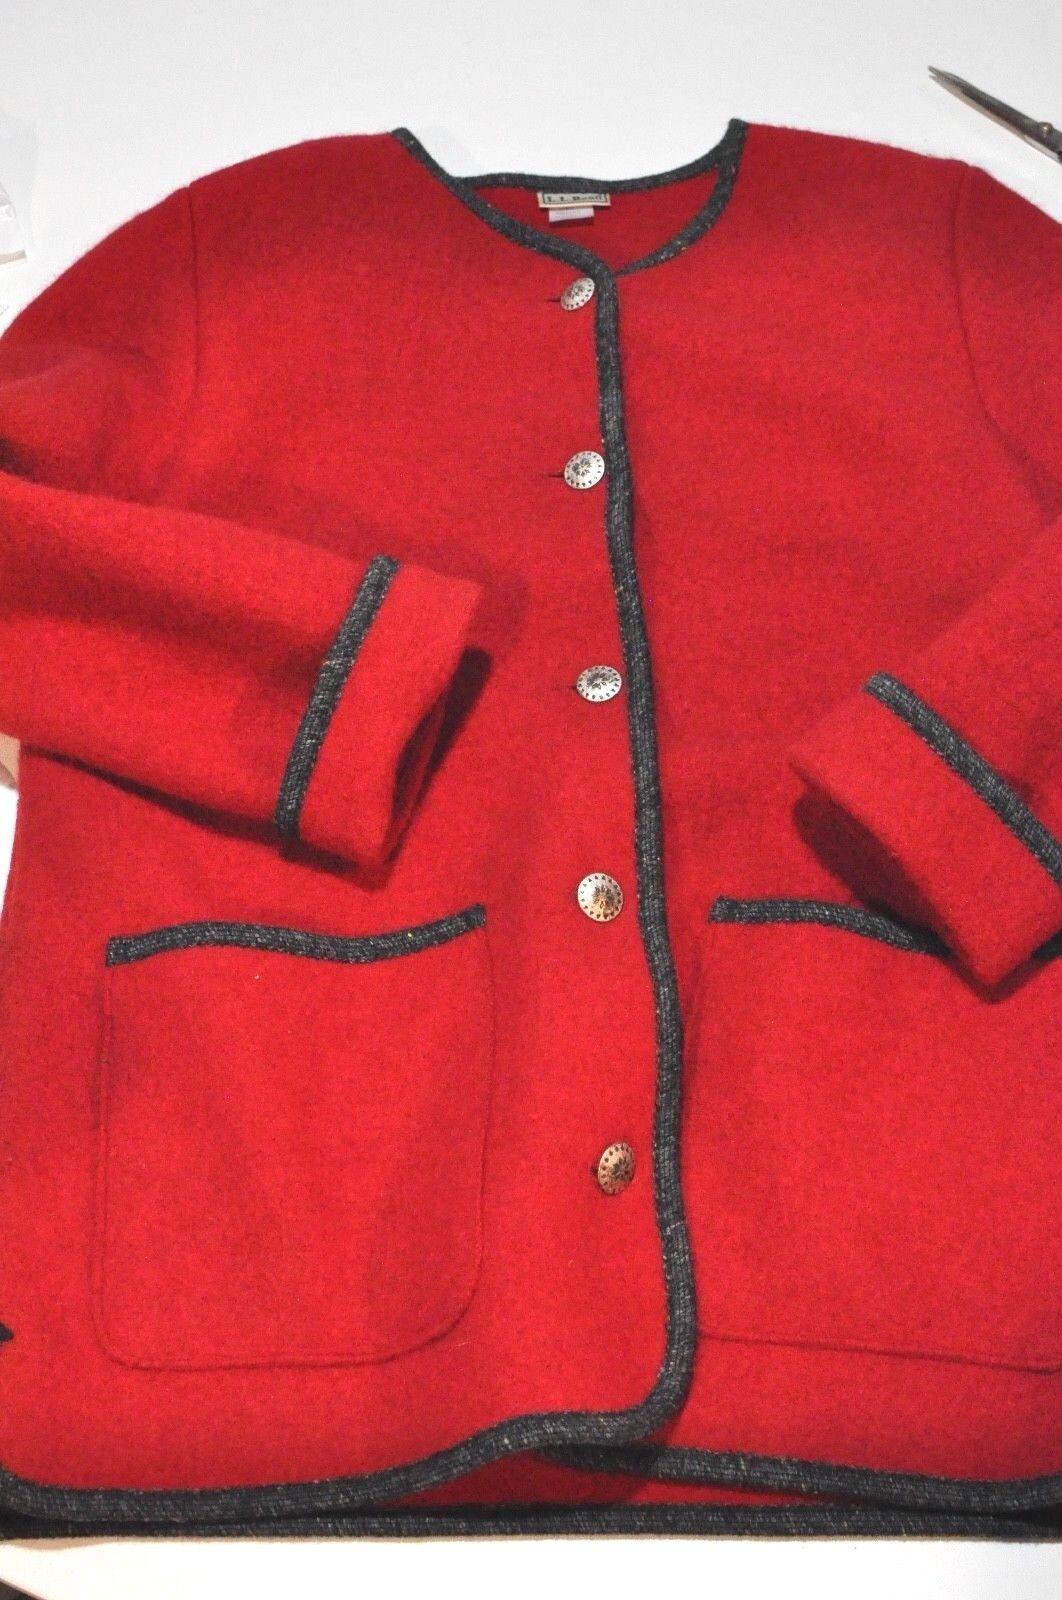 Vintage L.L. Bean Womens Medium red wool made in Austria